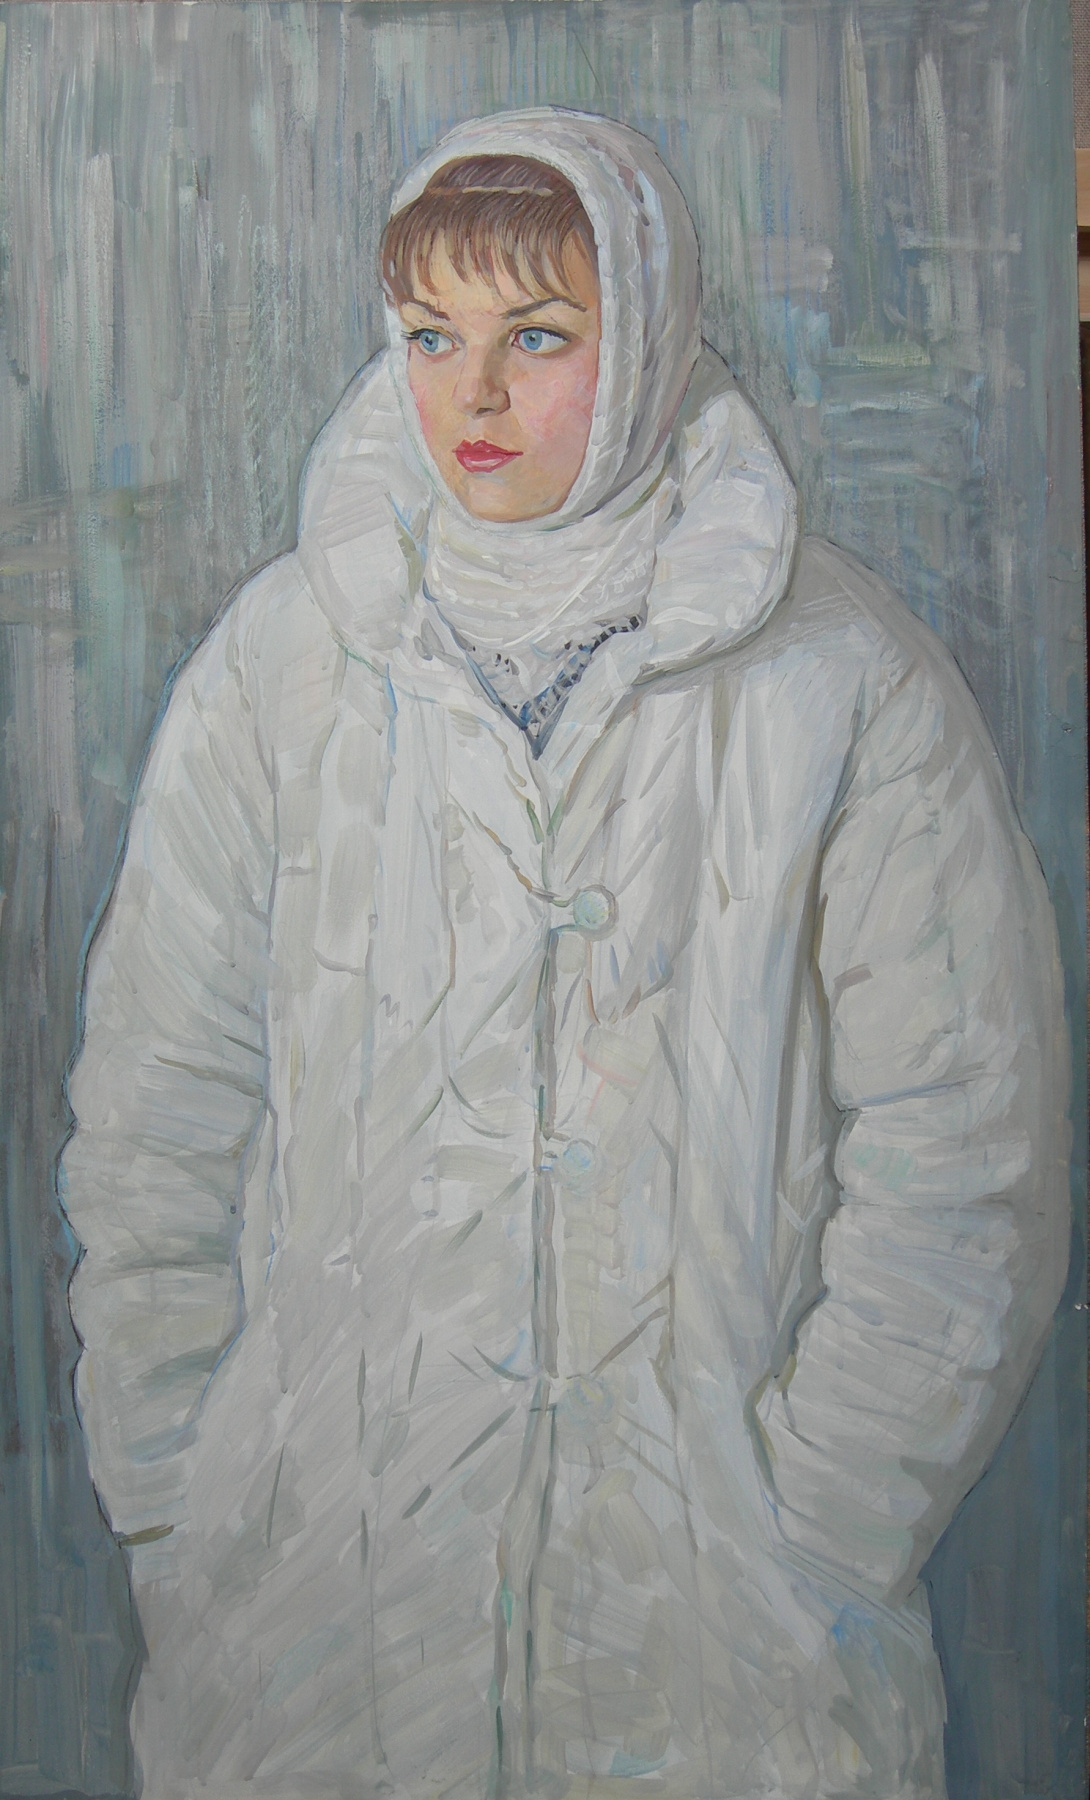 Eugene Alexandrovich Kazantsev. Portrait of the teacher Larisa Smirnova.